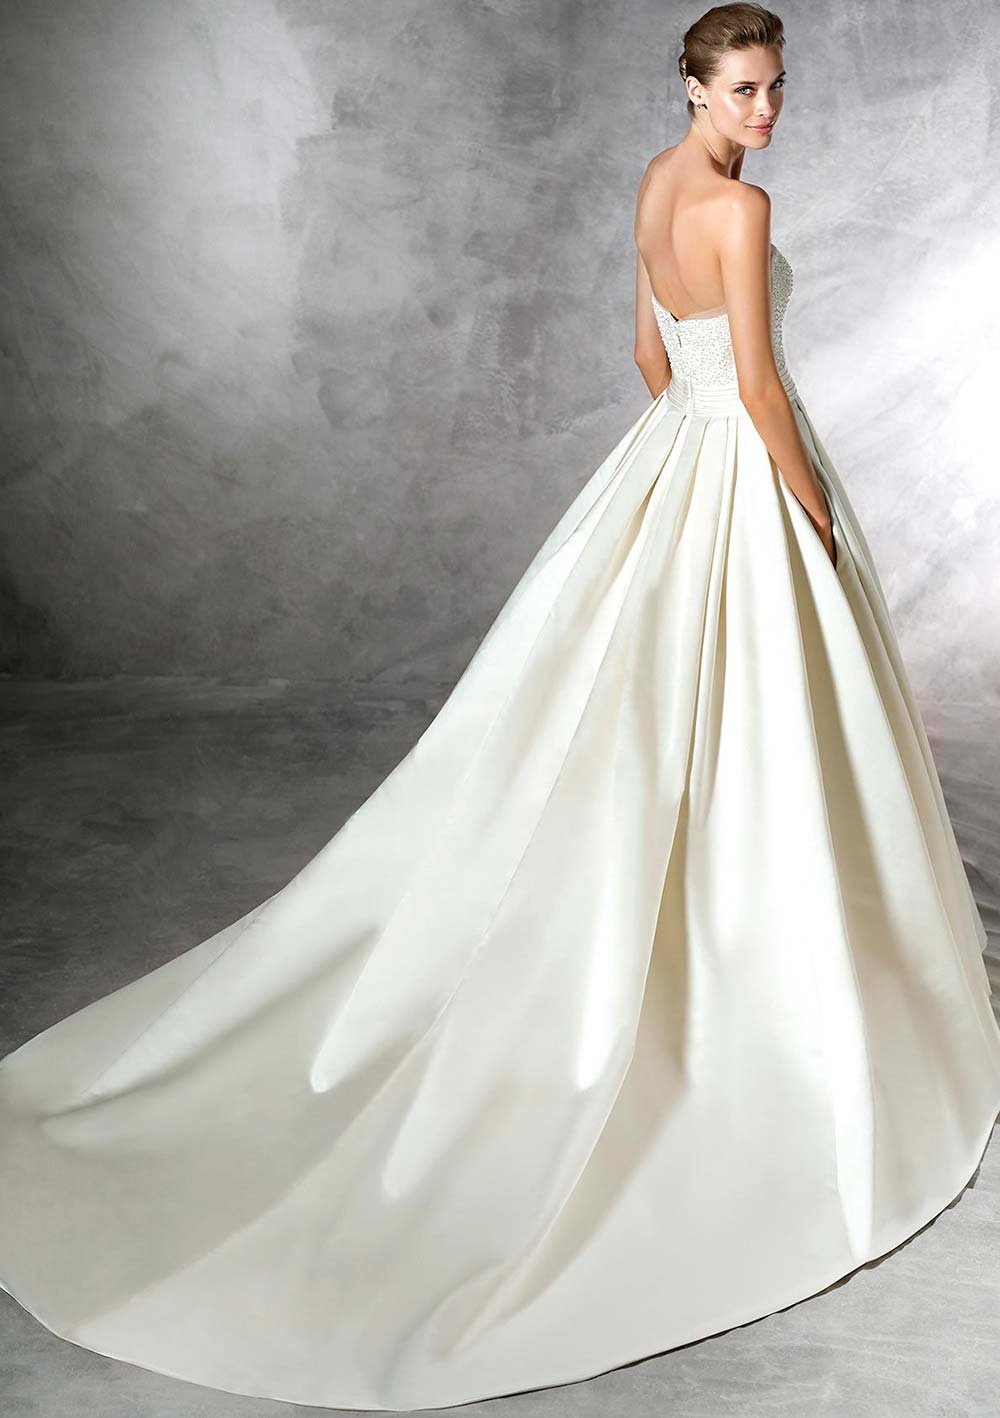 67d379578b1 Свадебное платье а-силуэт Pronovias Dalamo со шлейфом» — карточка ...